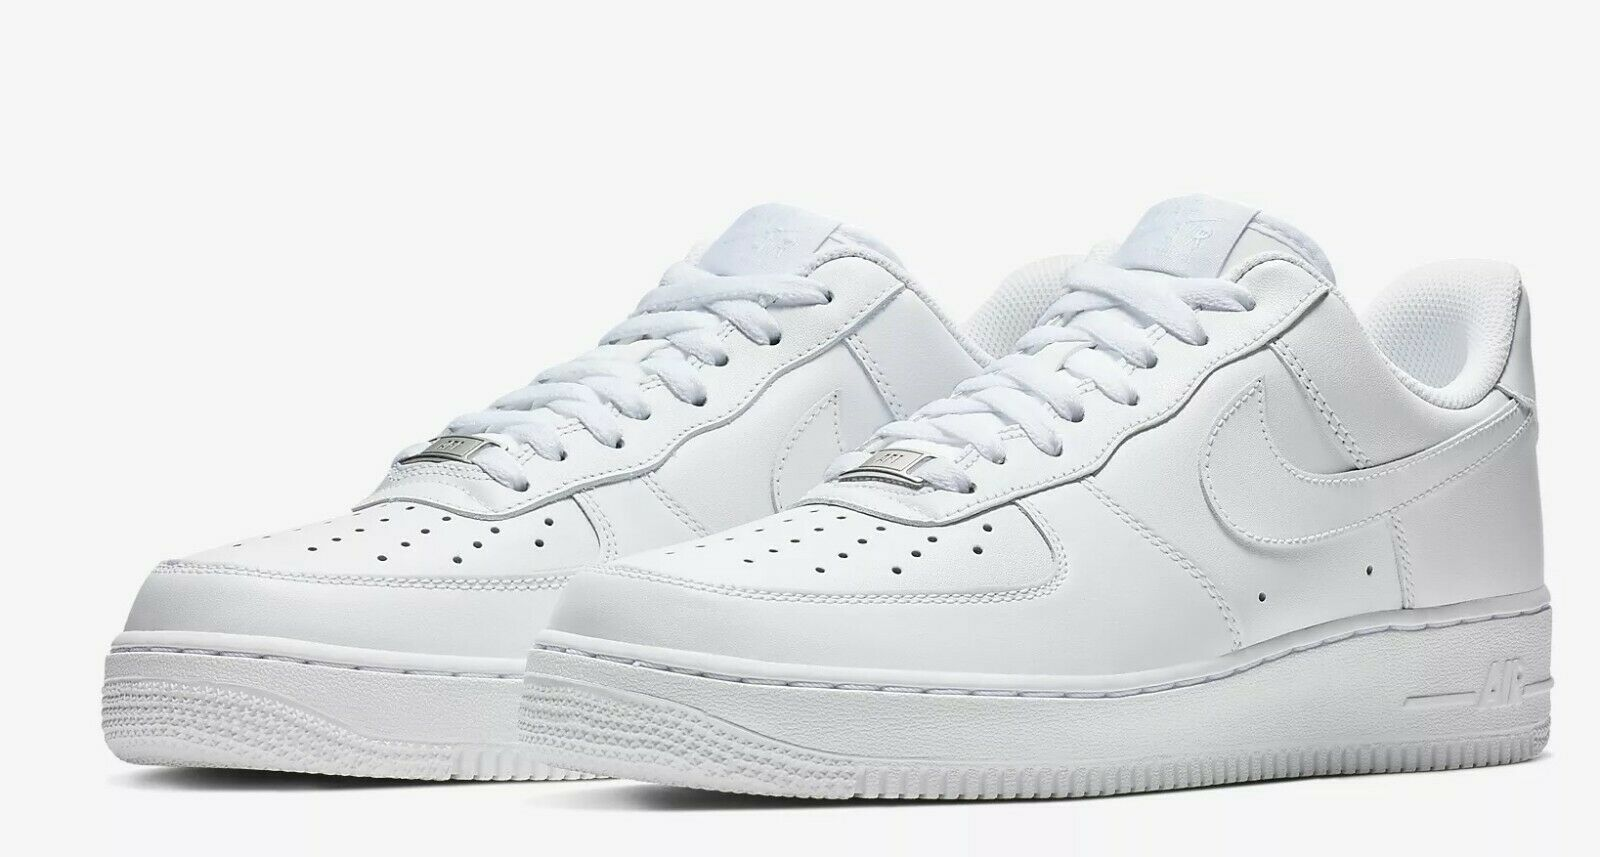 air force 1 low blanc or rose